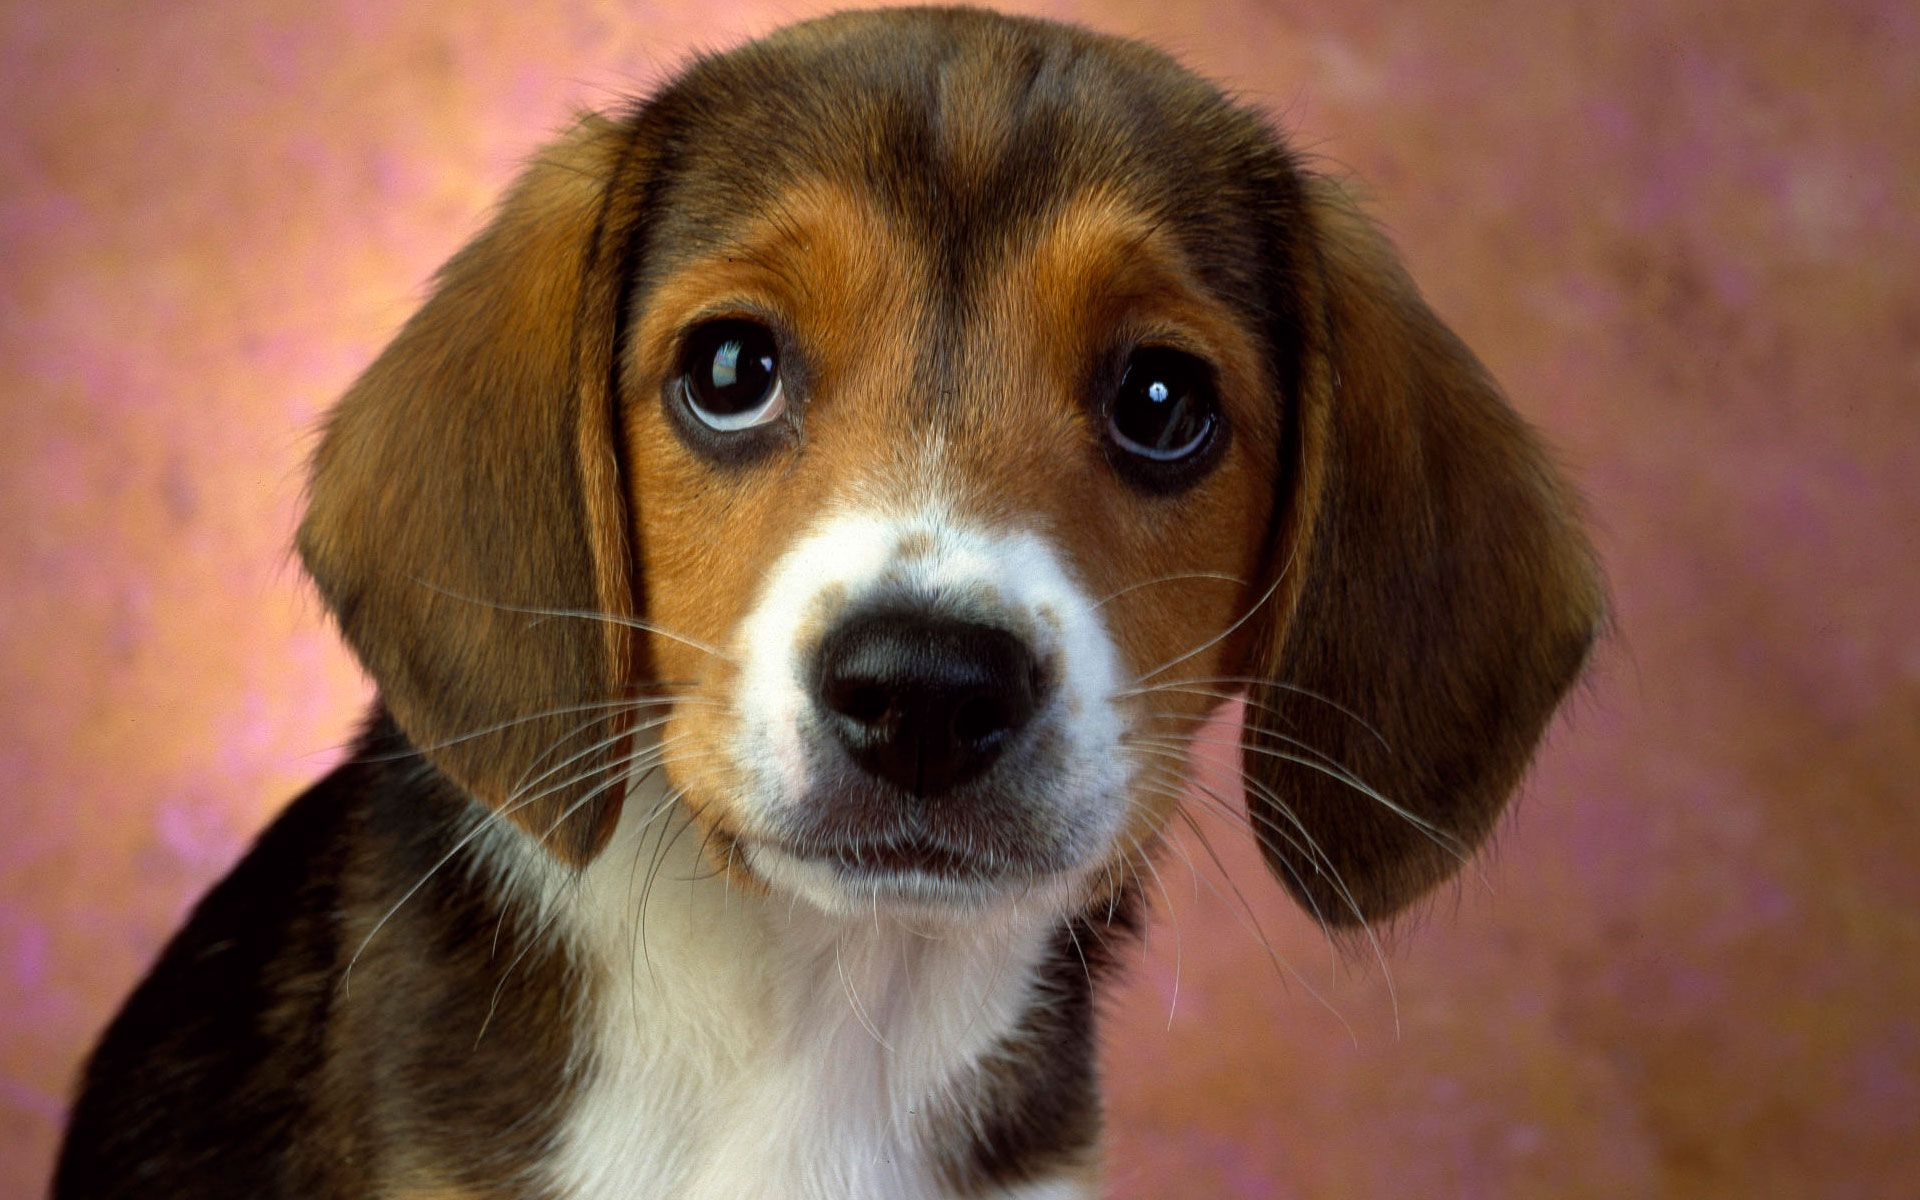 Top Smart Beagle Adorable Dog - 4e7b55f3722ee503aedfcbfc78433939  Trends_272391  .jpg